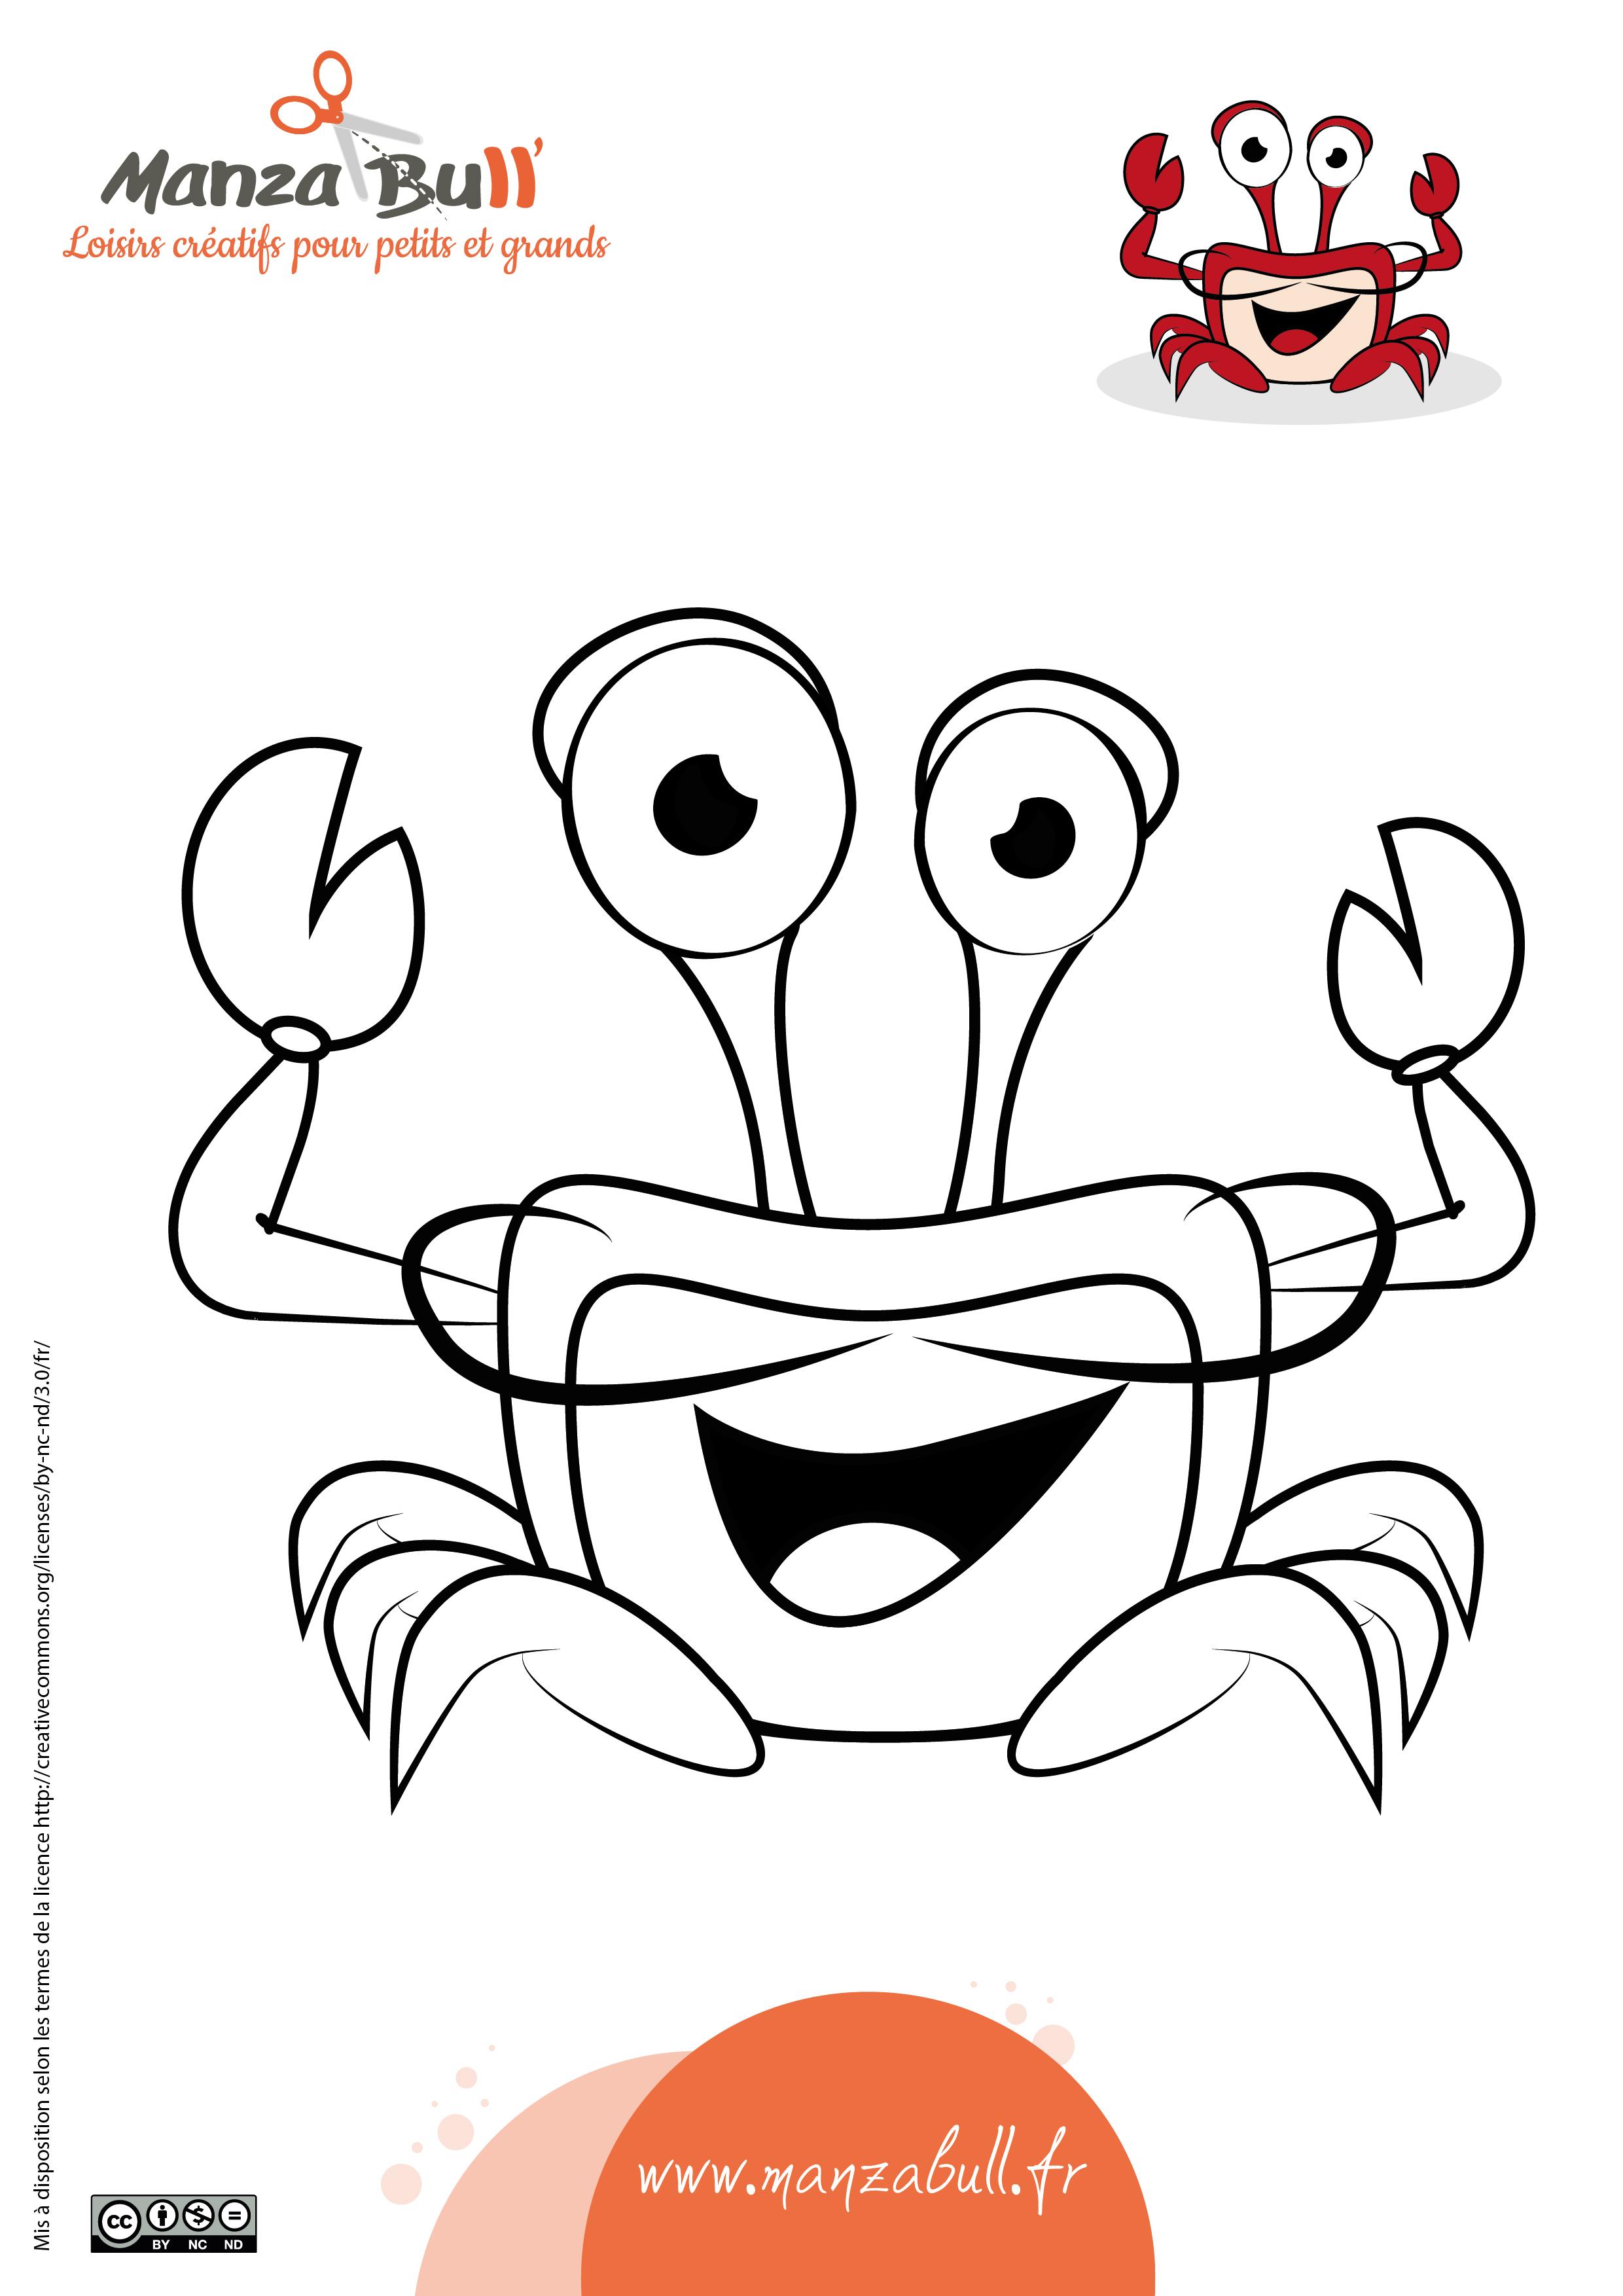 Coloriage crabe à imprimer - ManzaBull'